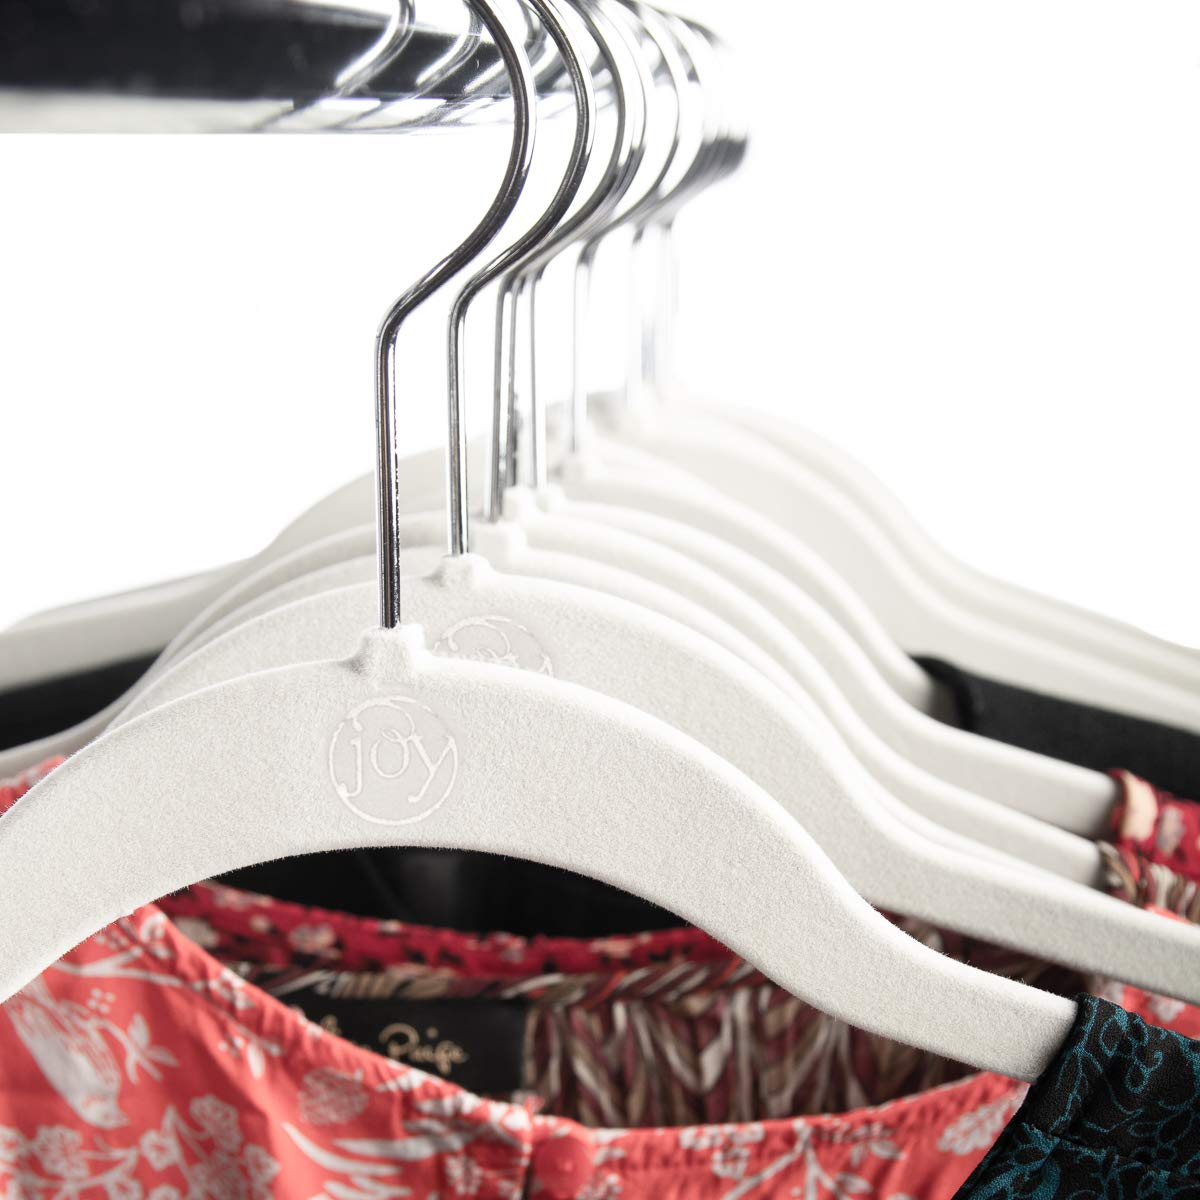 Joy Mangano 120 Pack White Huggable Hangers Non Slip Velvet Hangers Space Saving Clothes Hangers by Joy Mangano (Image #4)